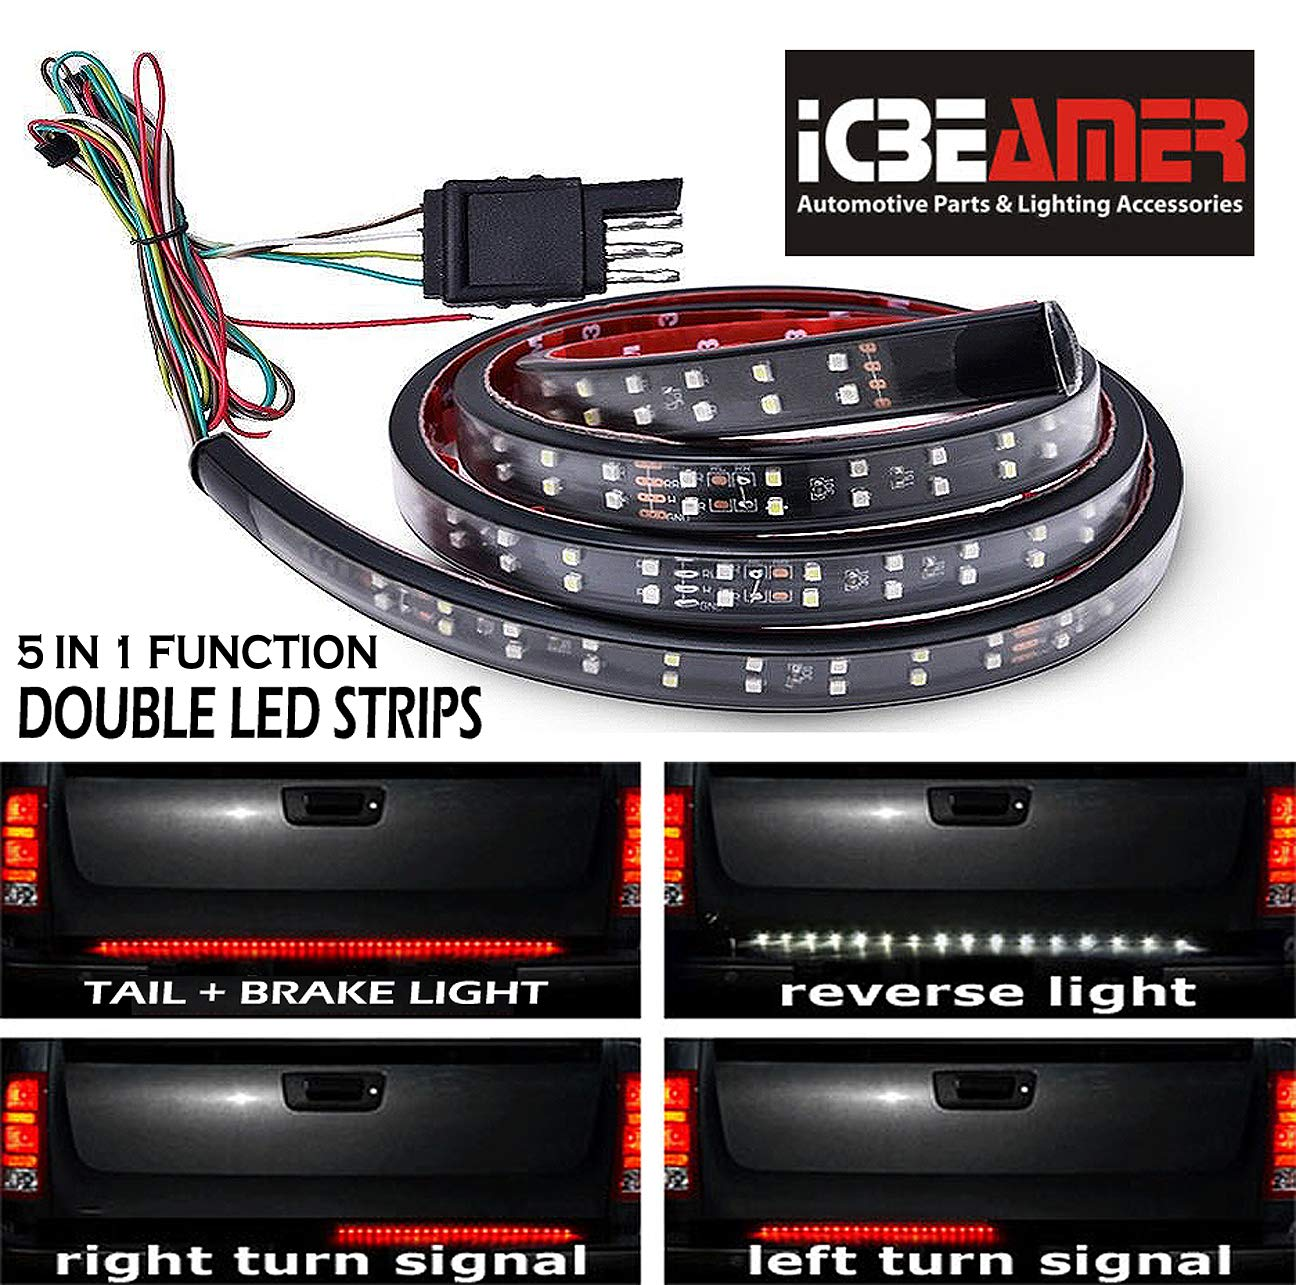 "ICBEAMER 5-Function 60"" 2 Row LED Truck Tailgate Side Bed Light Strip Bar Waterproof Reverse Turn Signal, Parking, Brake"